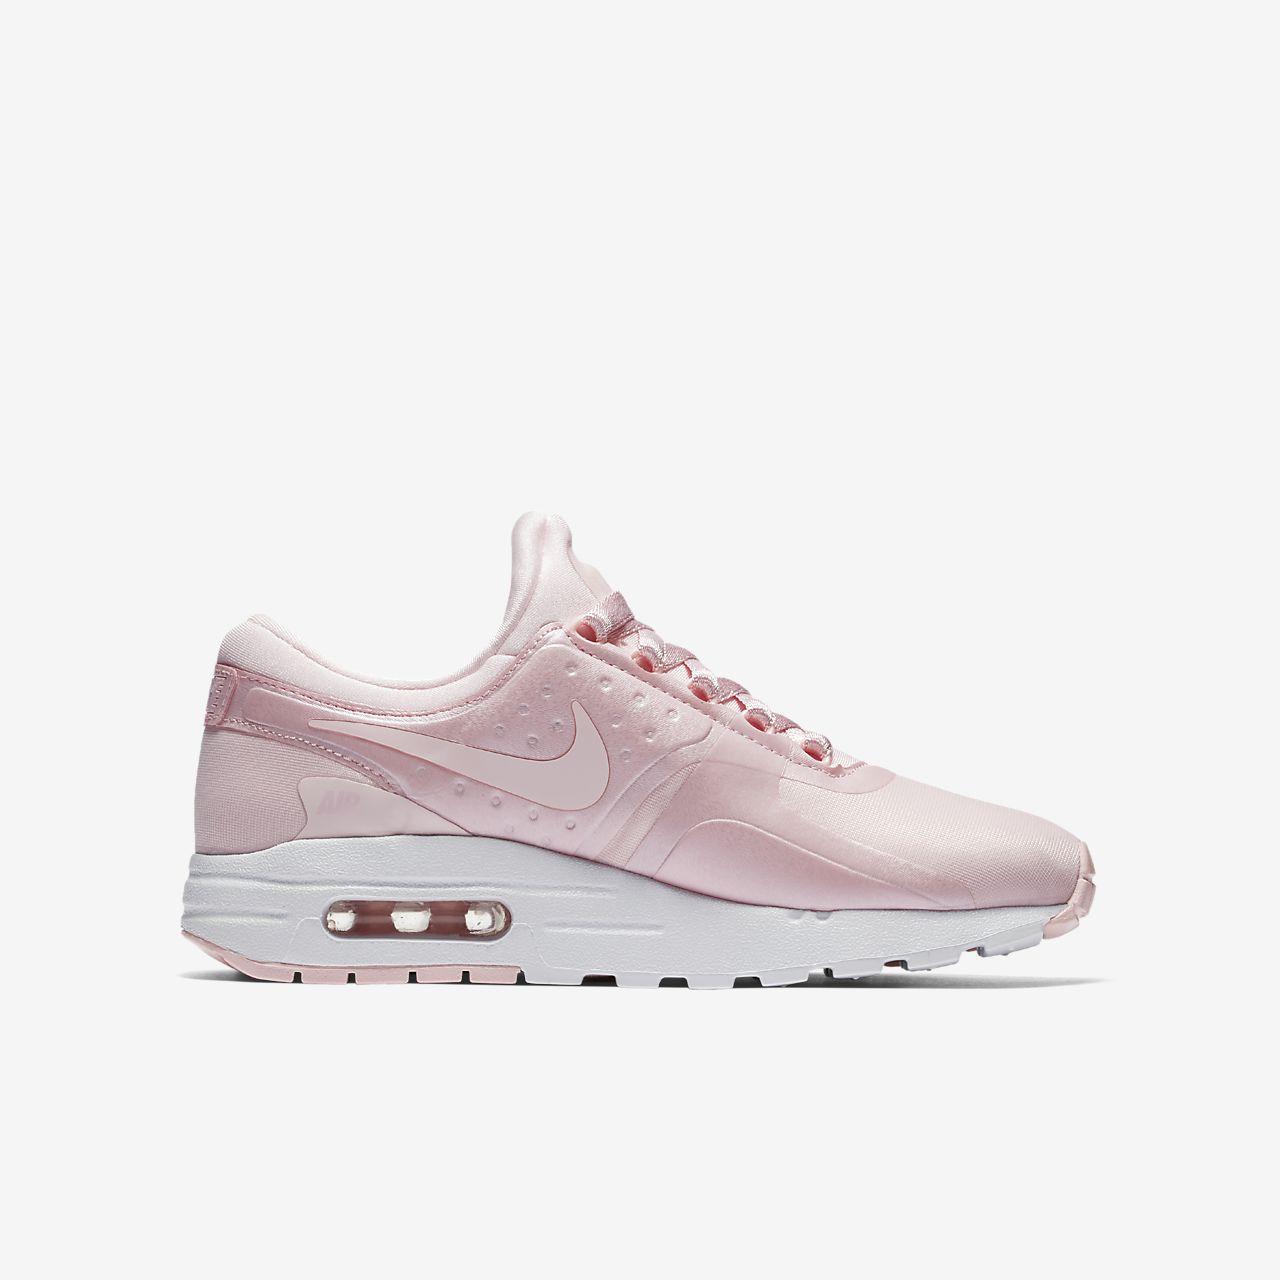 watch bbc94 11d6a ... low price nike air max kids pink bc7f6 dc0cd